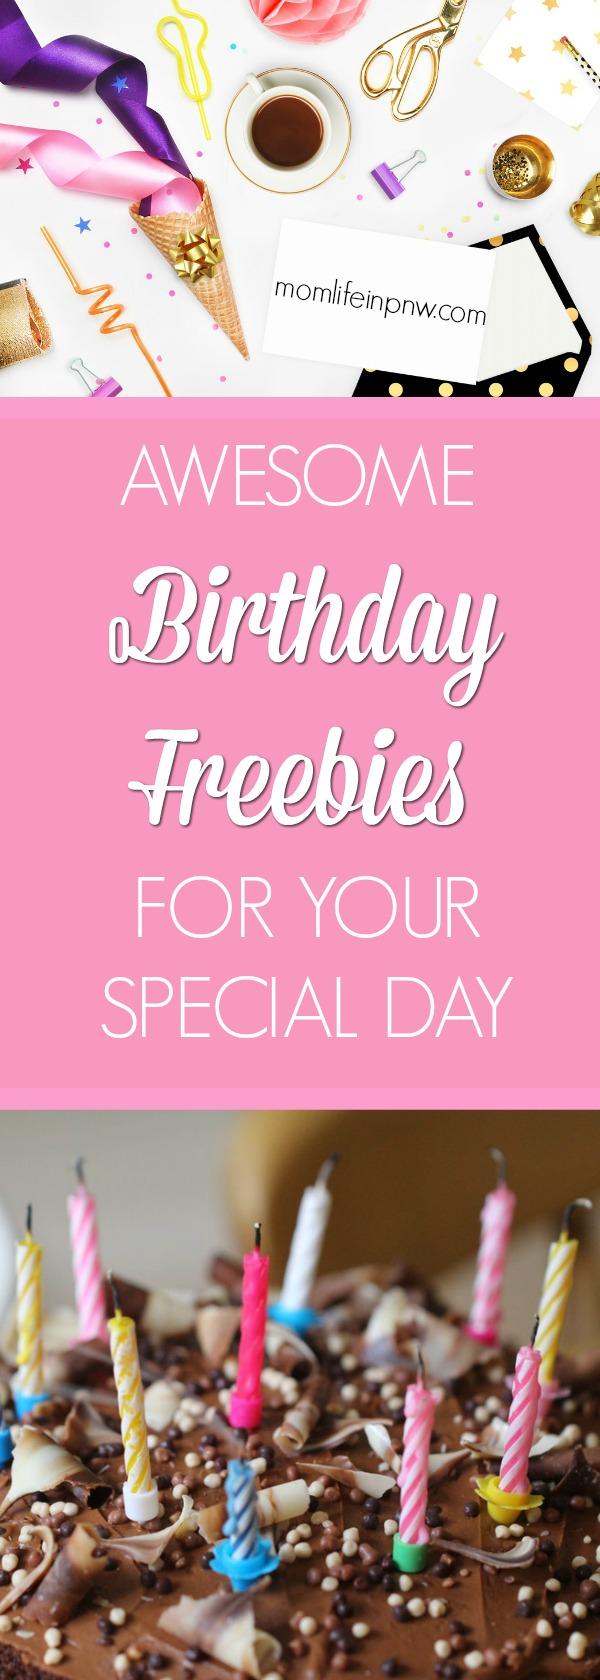 Freebies on your birthday in las vegas